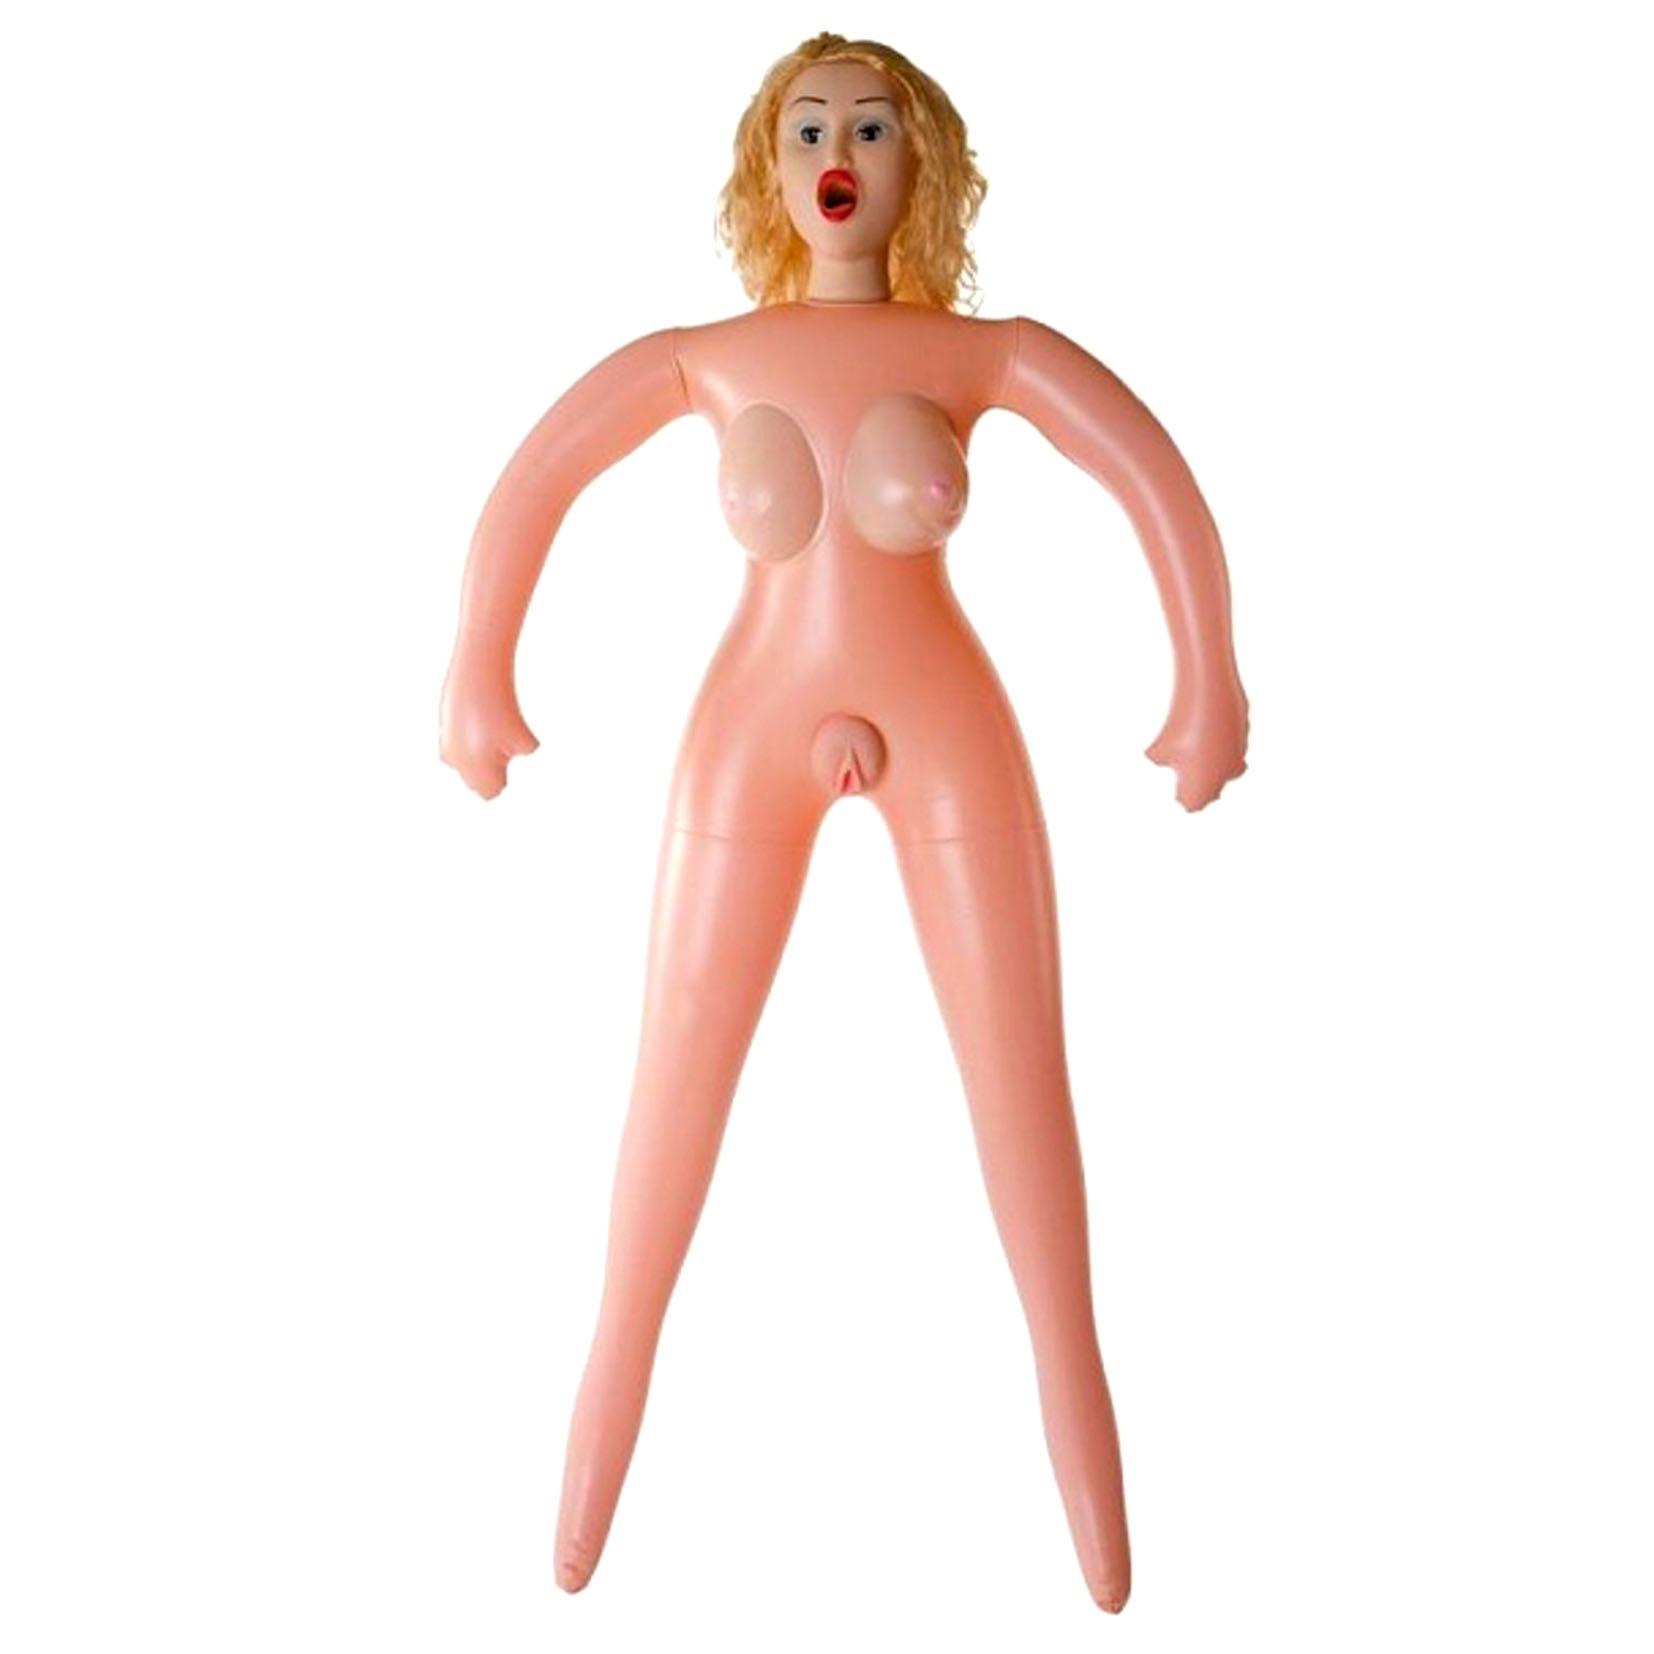 секс кукла надуваная женжина для маструбации и траха в рот и пизду